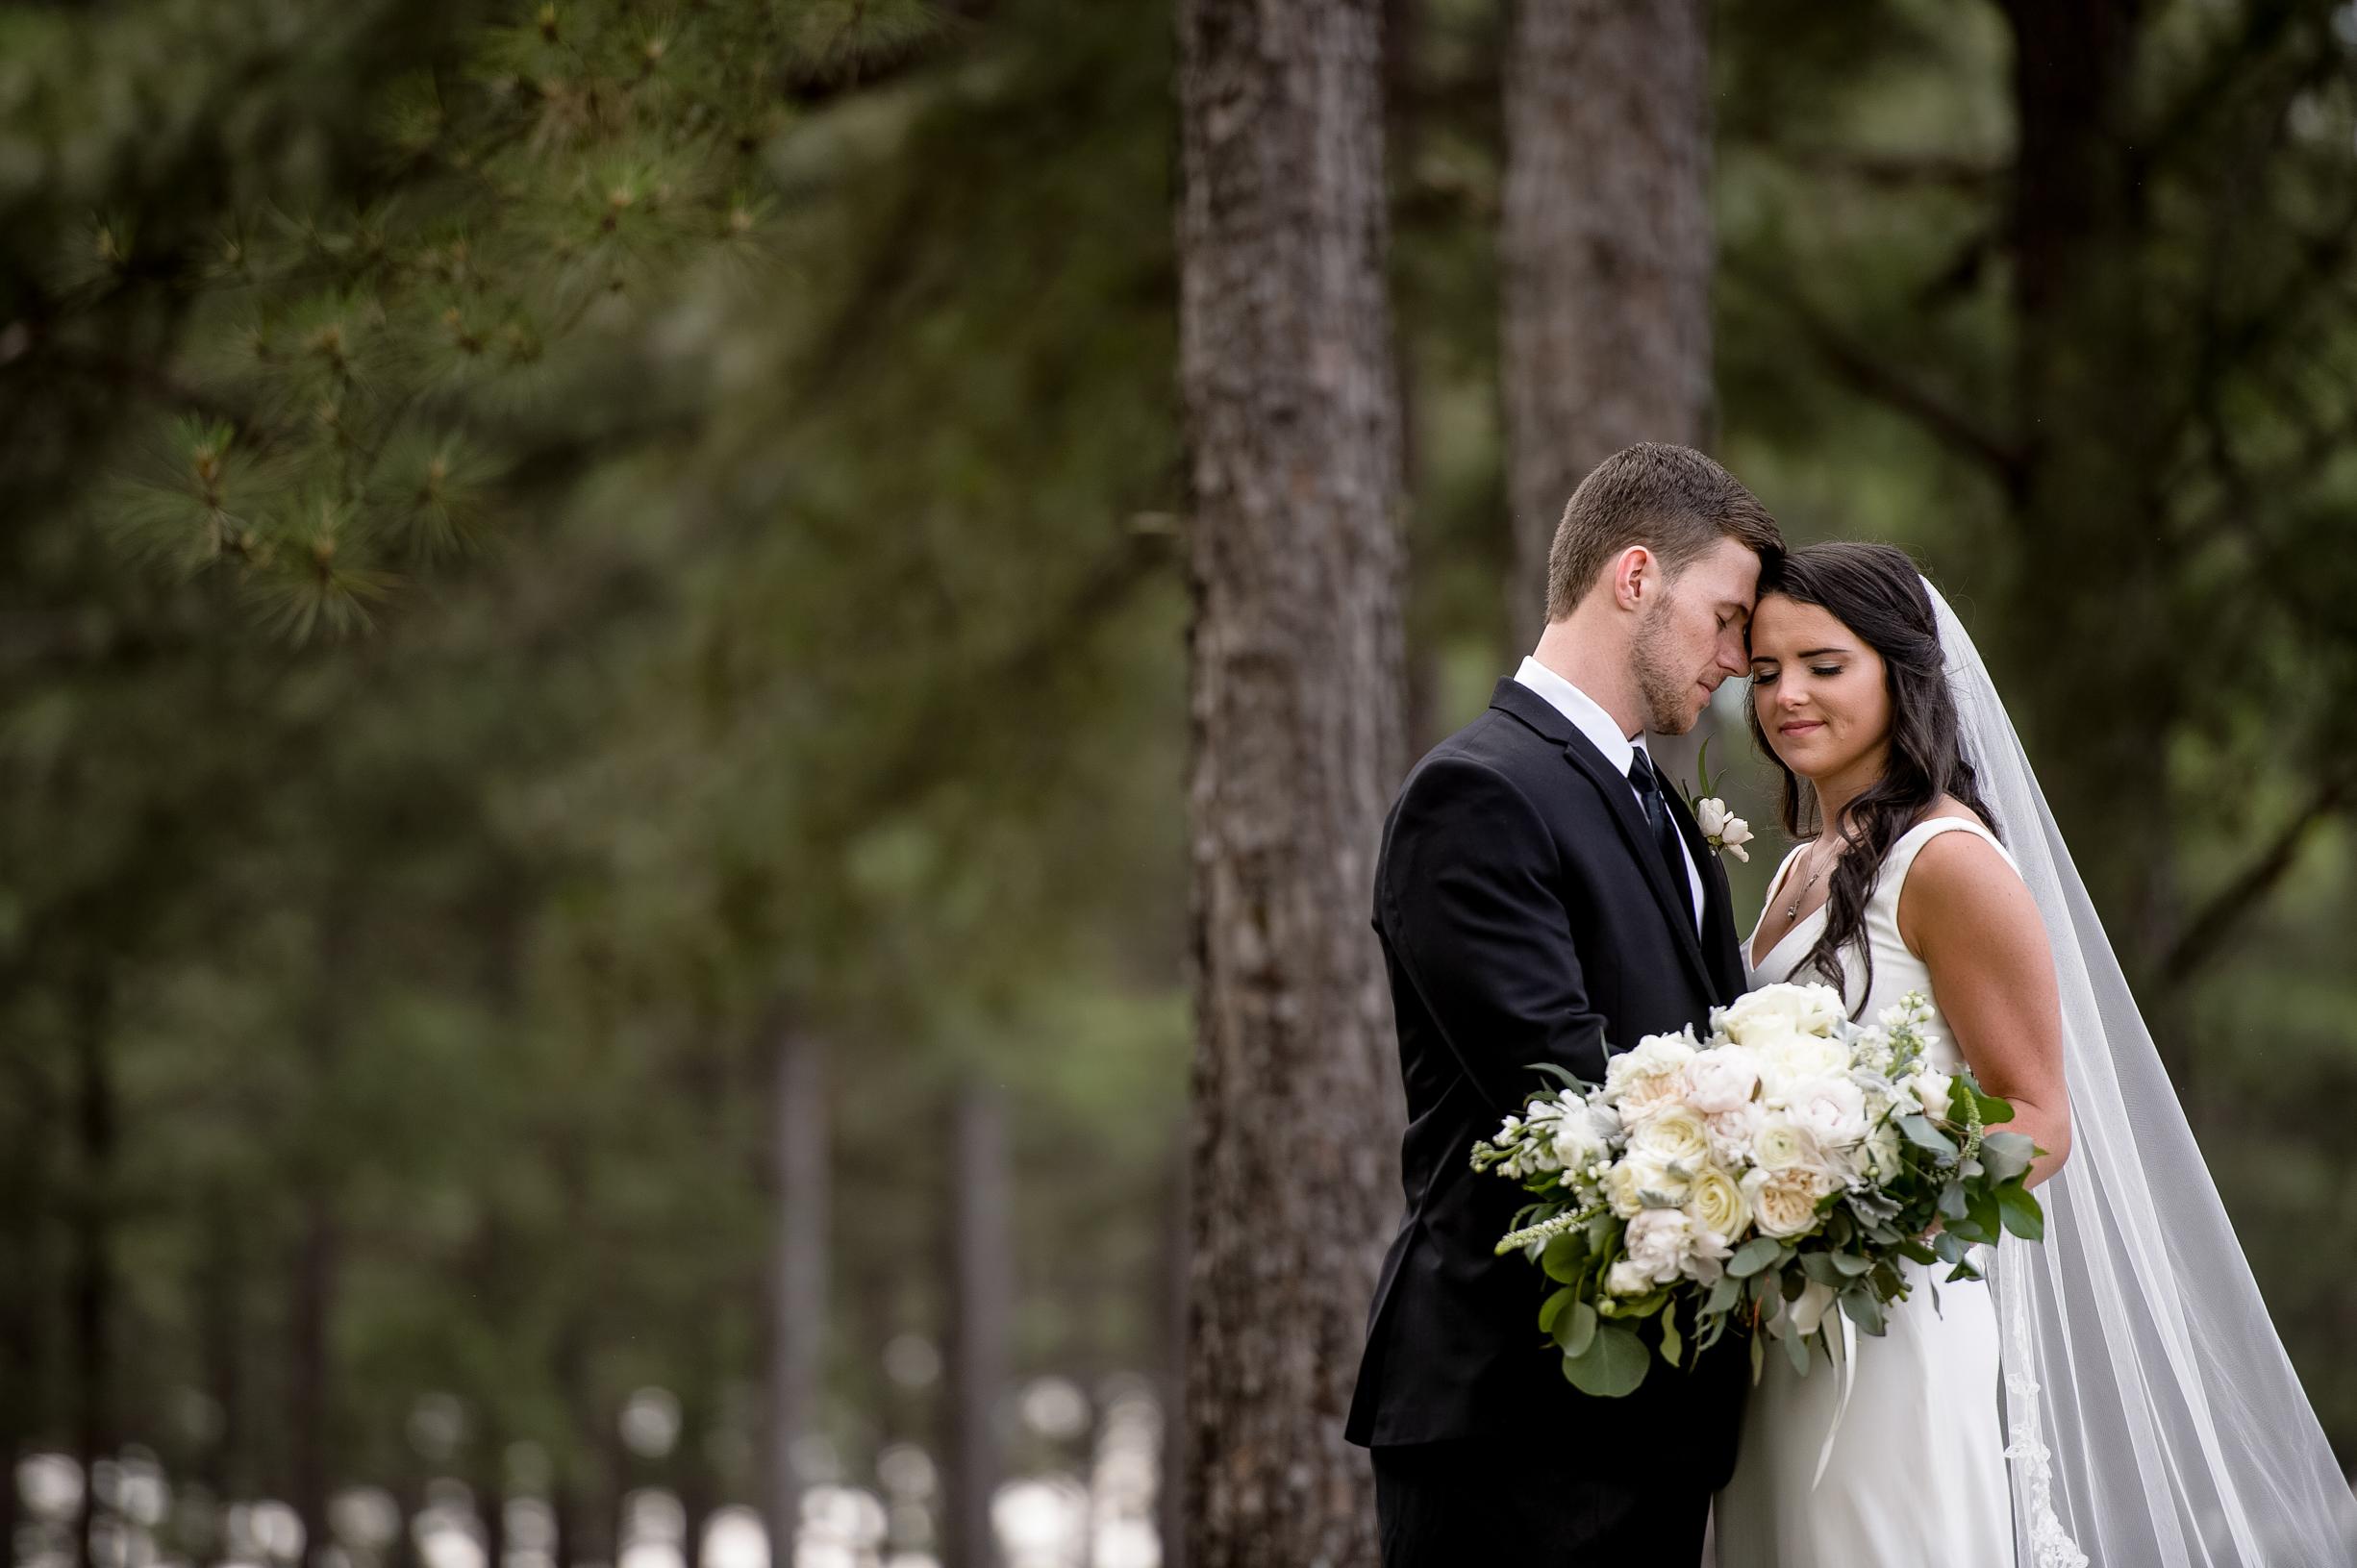 Royal Wedding with Outdoor Reception-24.JPG